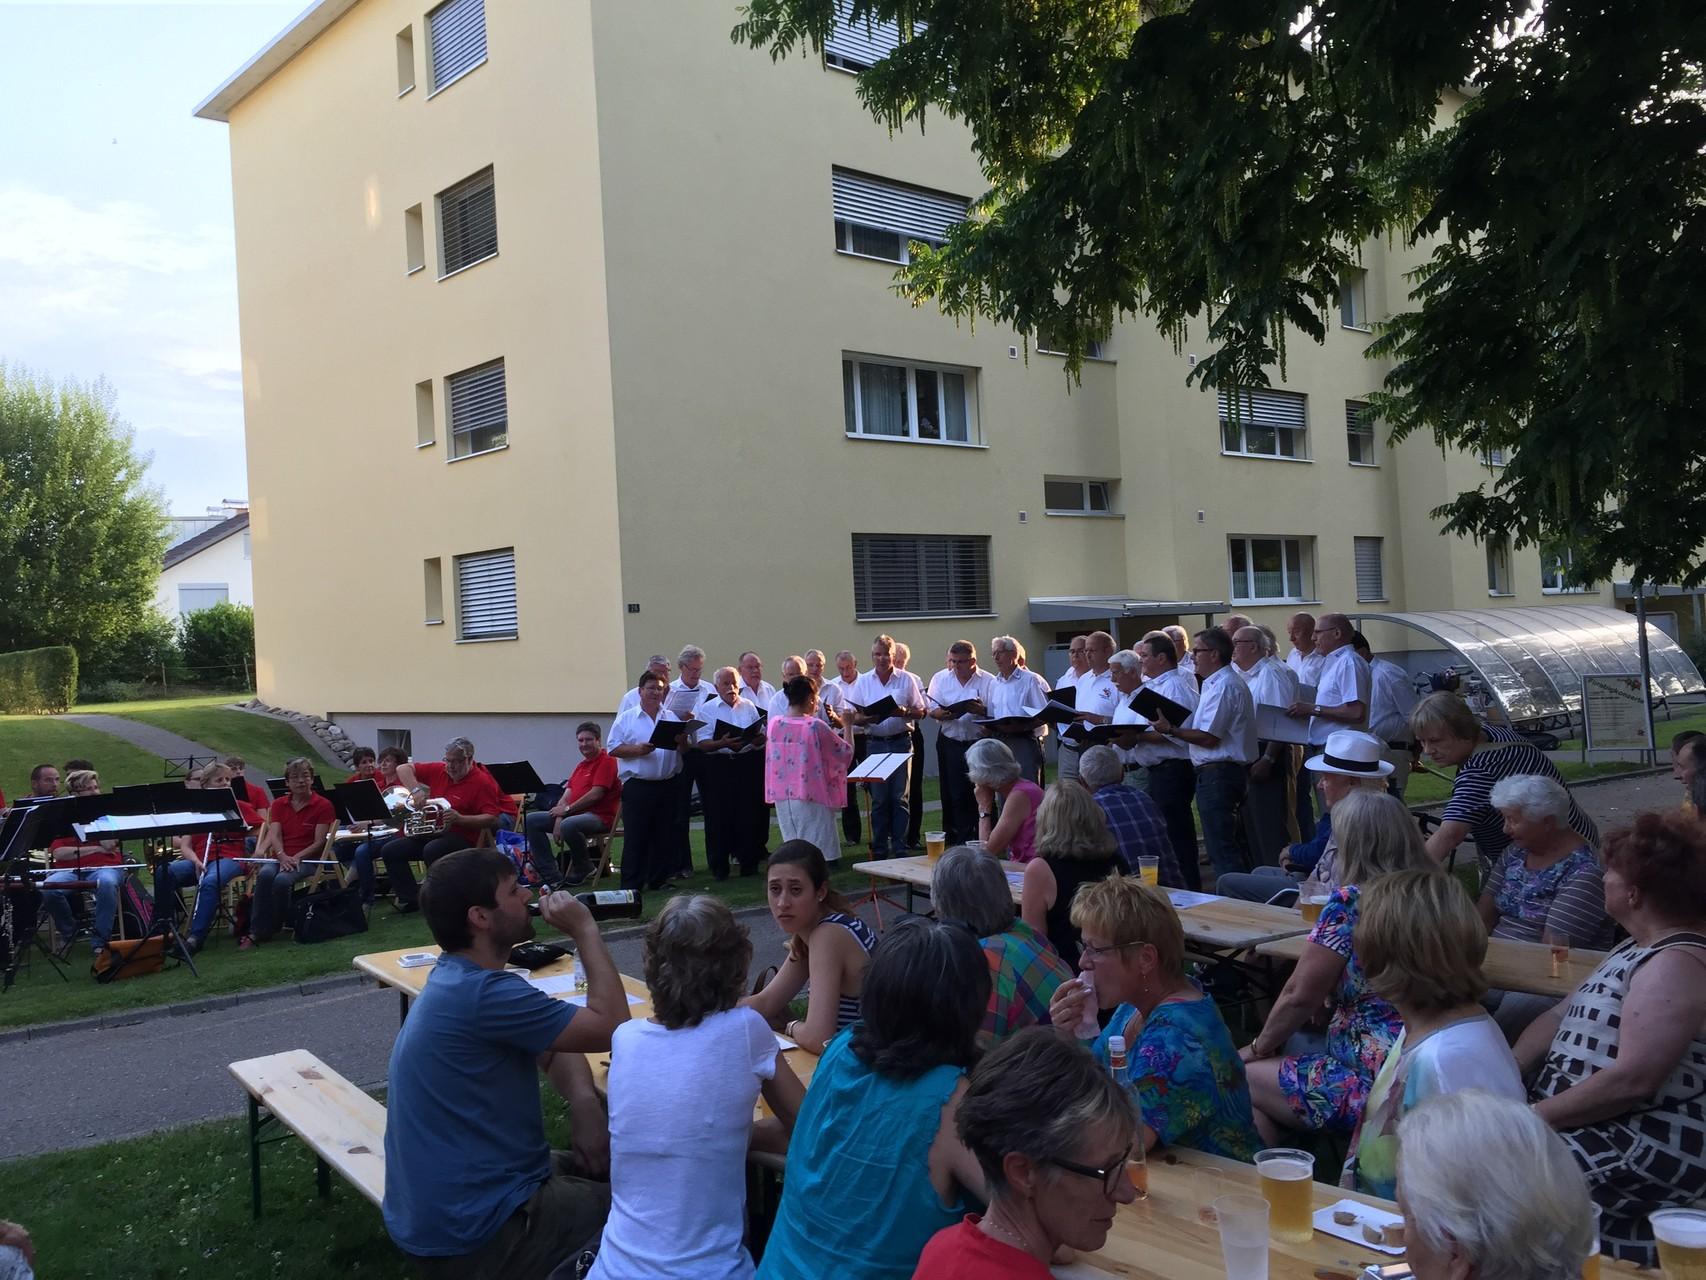 Schulstrasse 02.07.2015